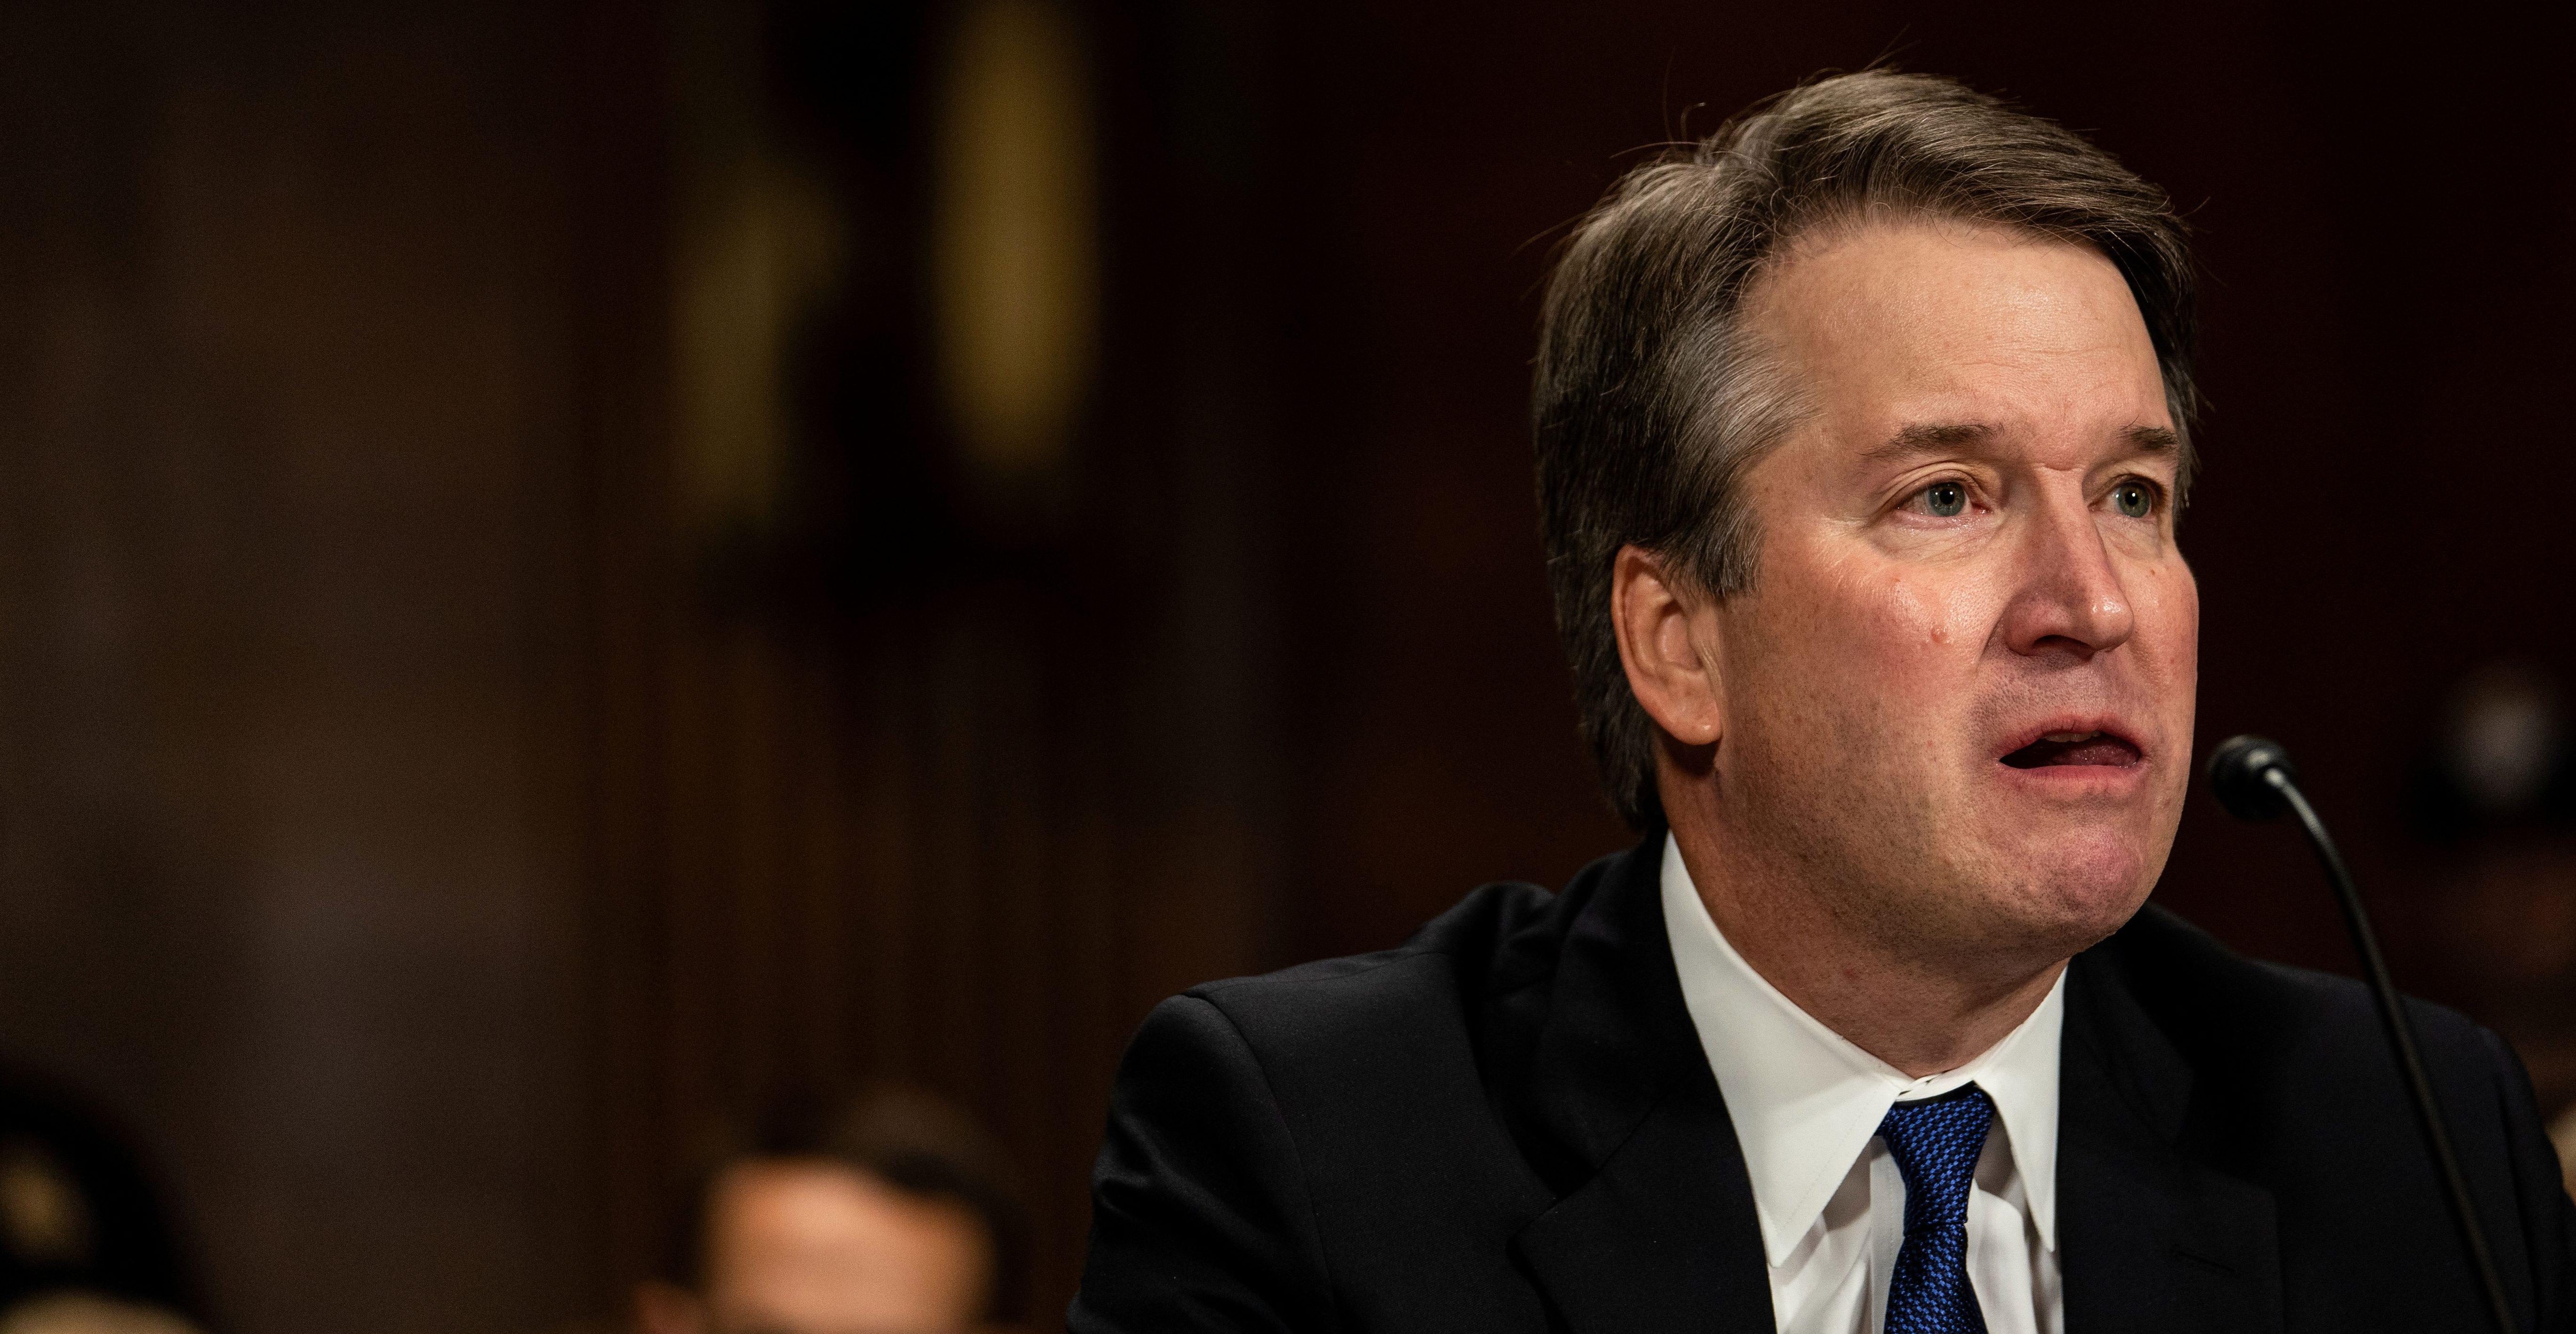 Brett Kavanaugh testifies before Senate judiciary committee